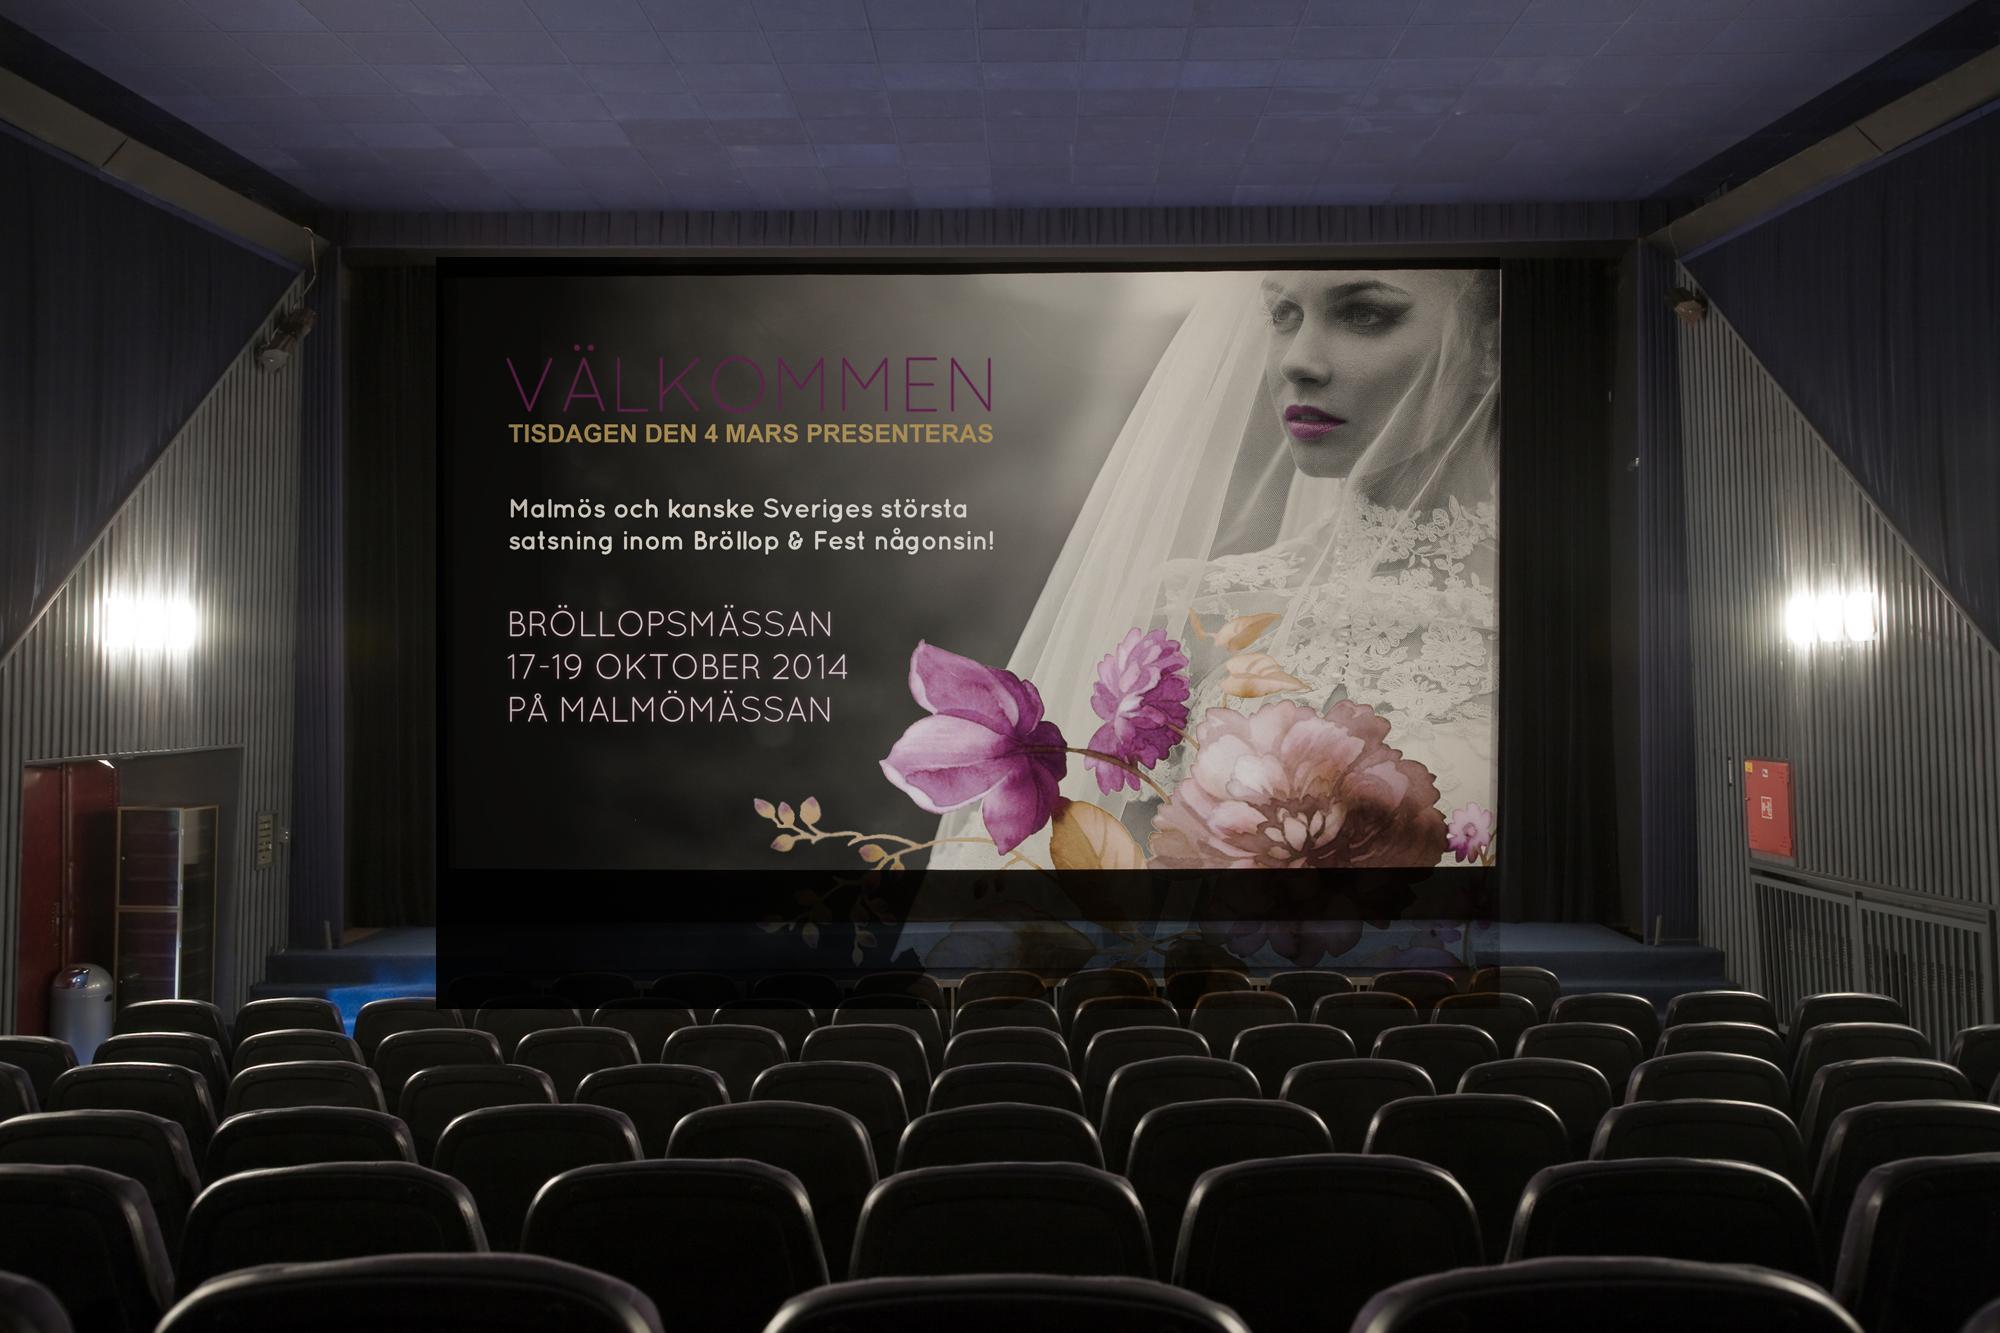 Susanna Soumah, Maria Soumah, S. Reklam & Design, bröllopsmässan, Soumah, Event, Träff, Reklam,